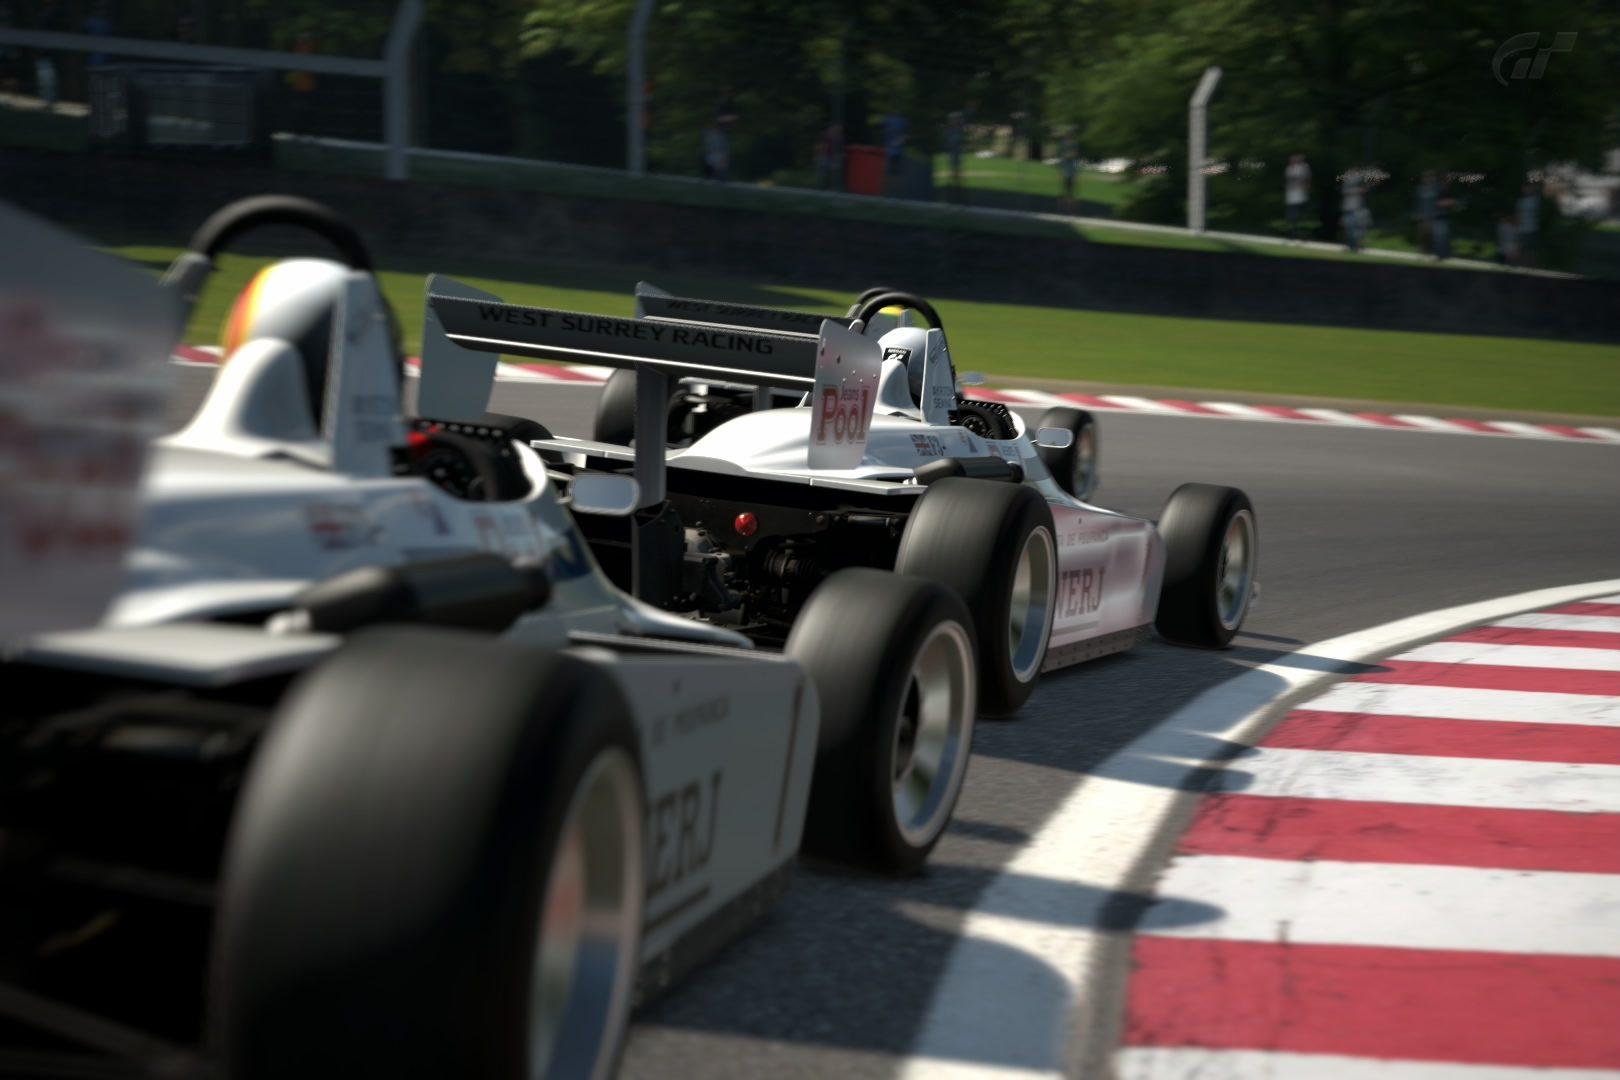 Brands Hatch Grand Prix Circuit '80s_13.jpg